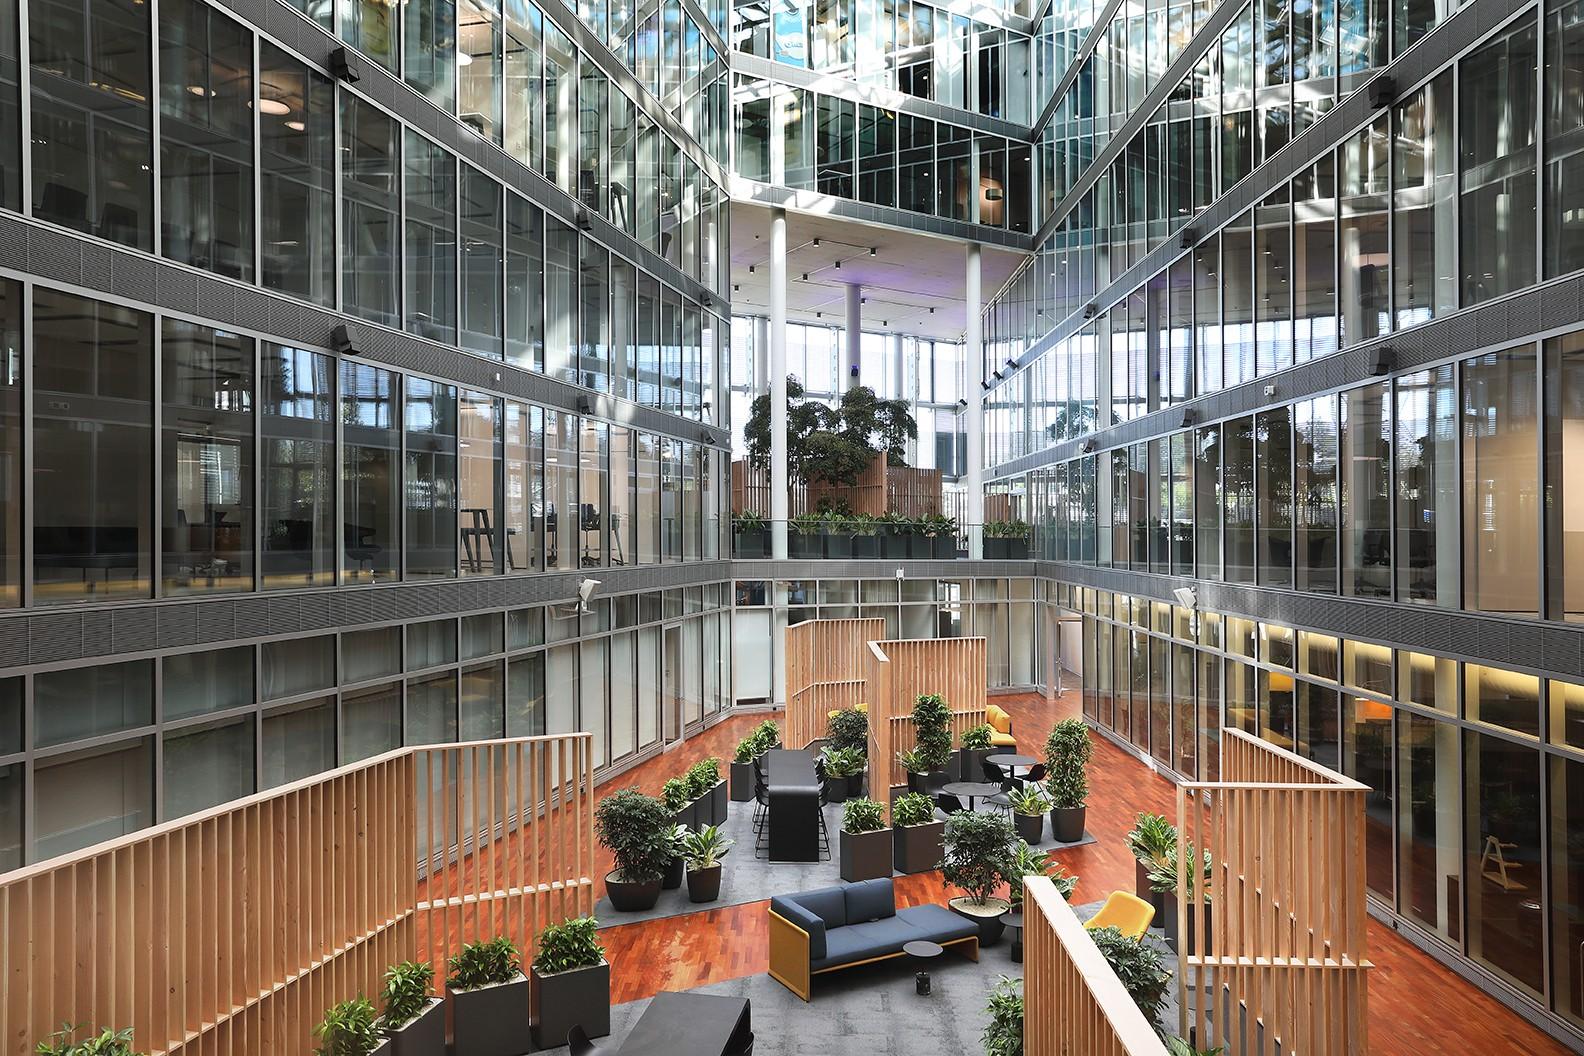 Allreal | Büroeinrichtung - Büroplanung - Innenausbau | WSA